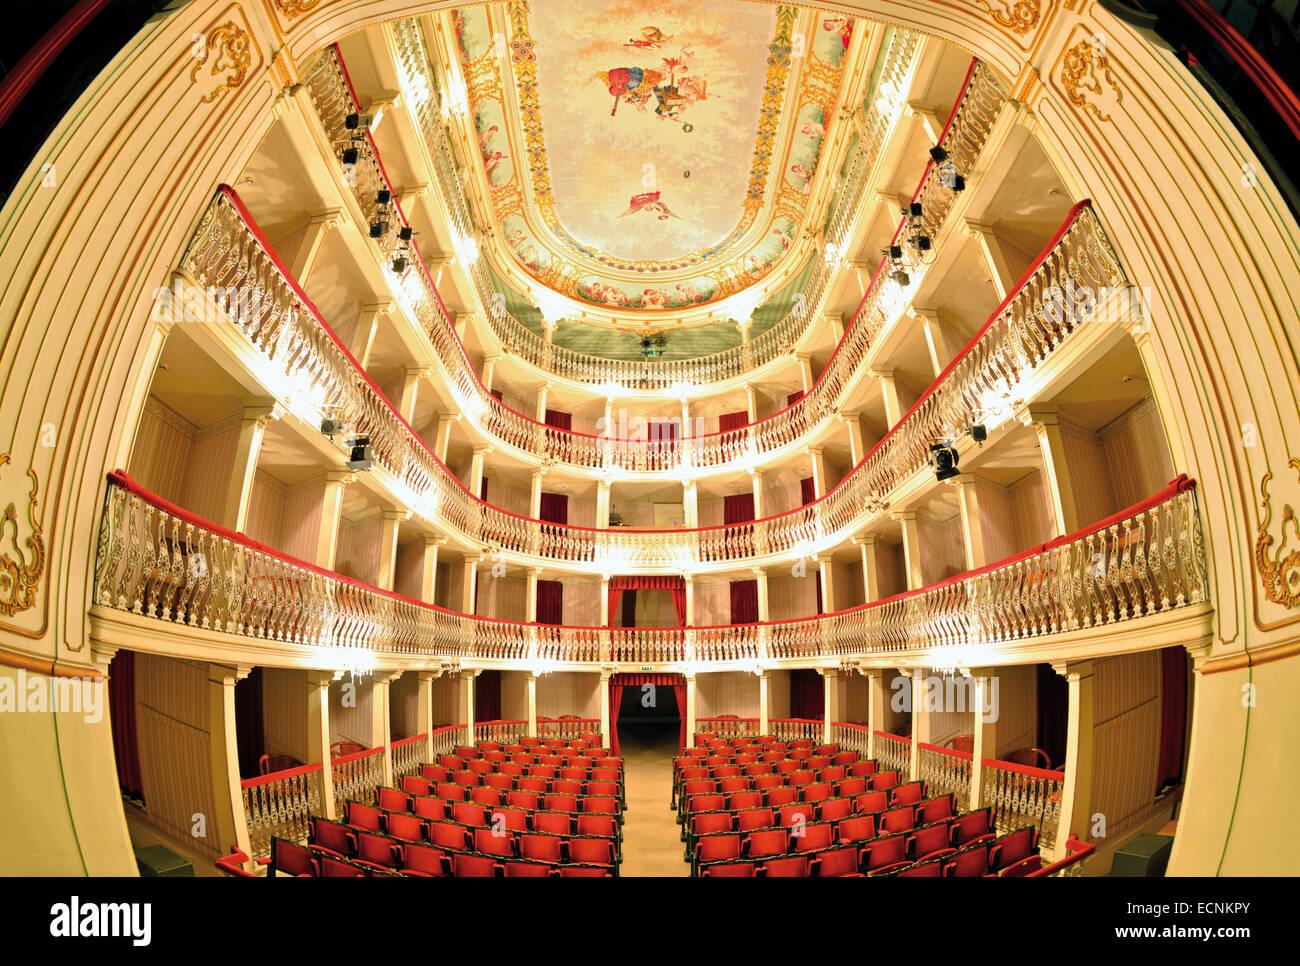 Portugal, Algarve: Auditorium of the historic theater Teatro Lethes in Faro - Stock Image